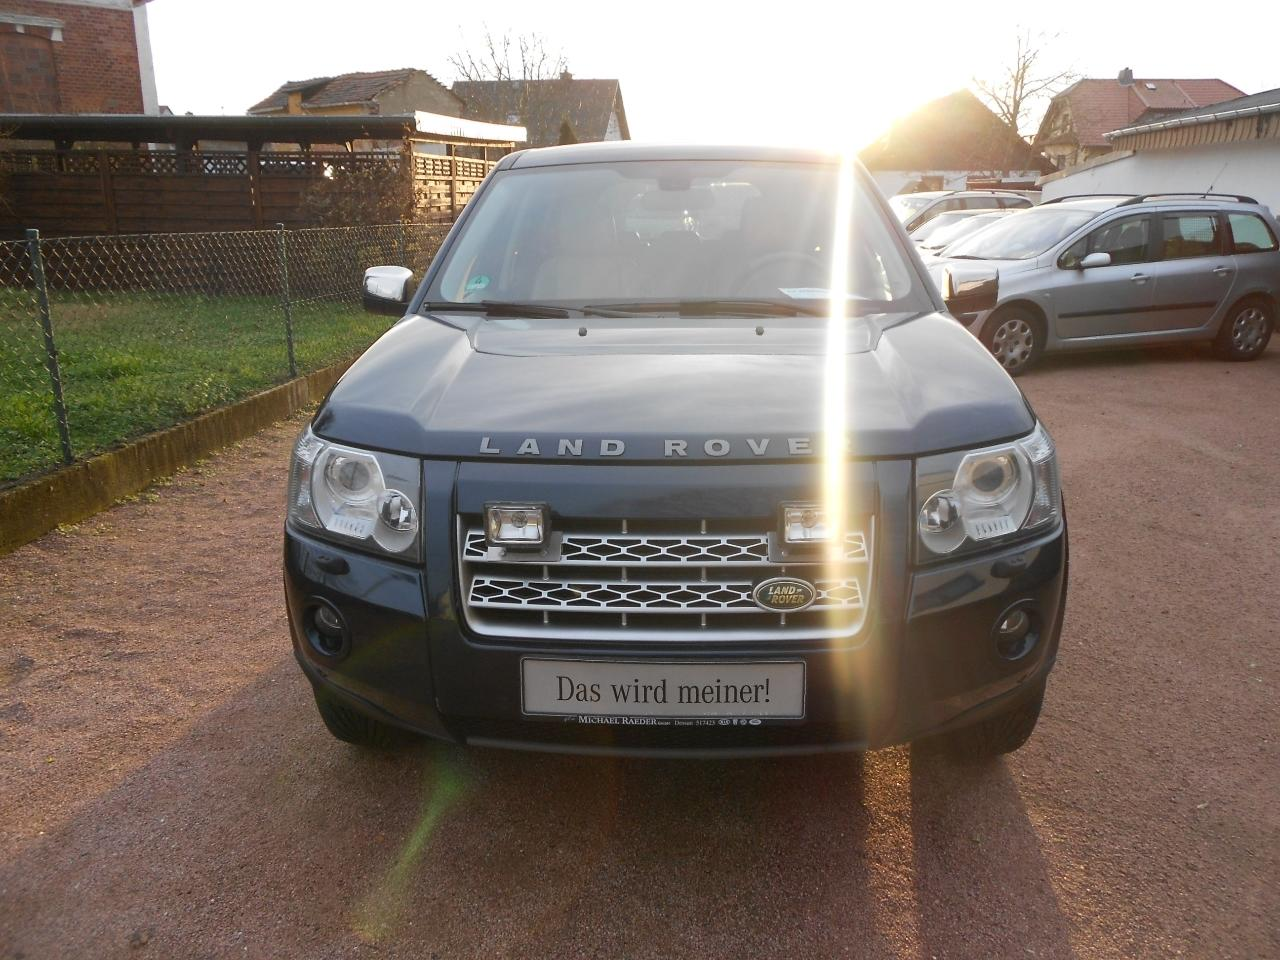 Autos nach Land Rover Freelander